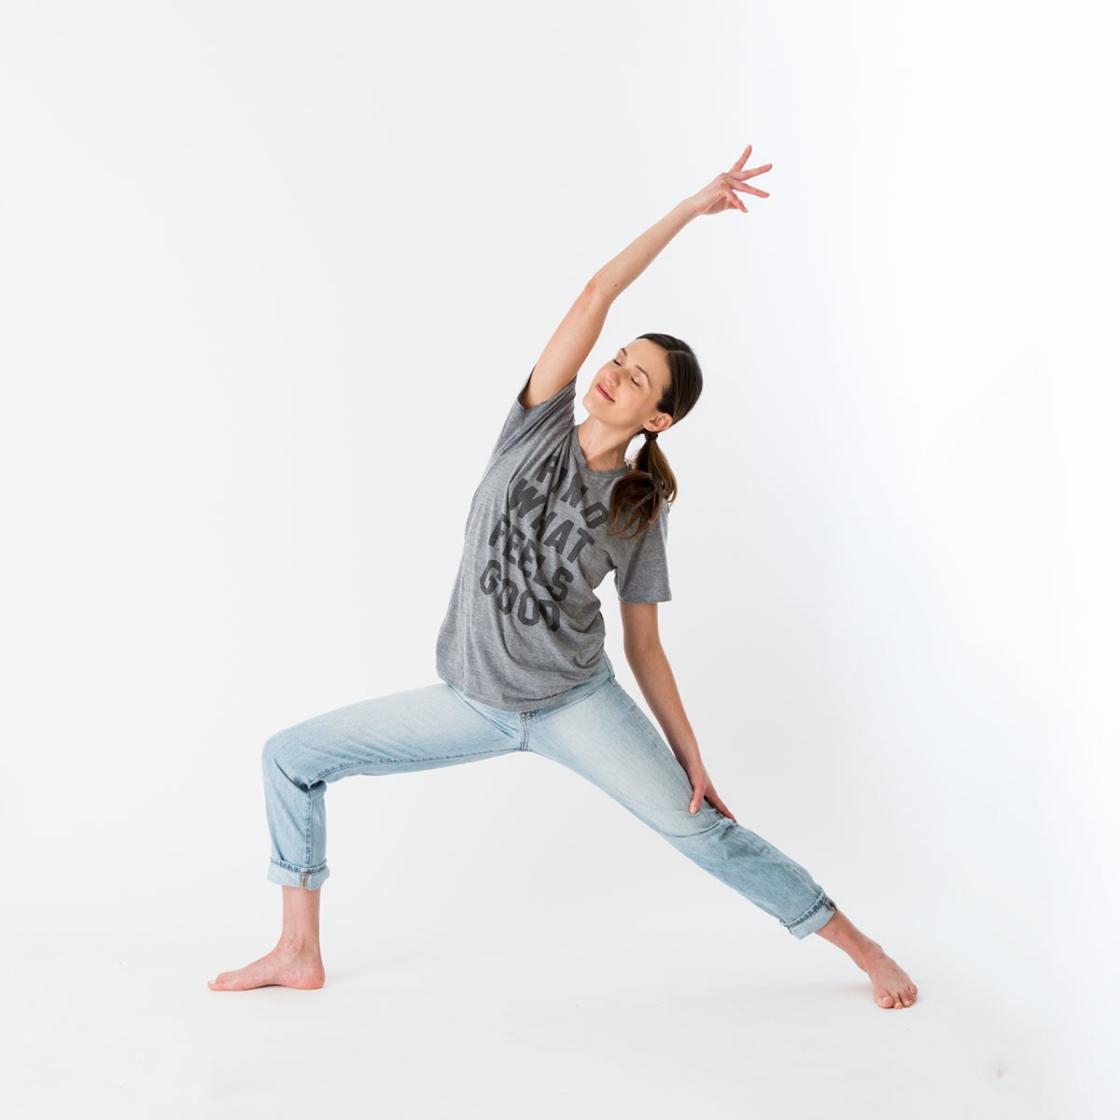 Monica Ahuja, Issue 13 Lifestyle Photo